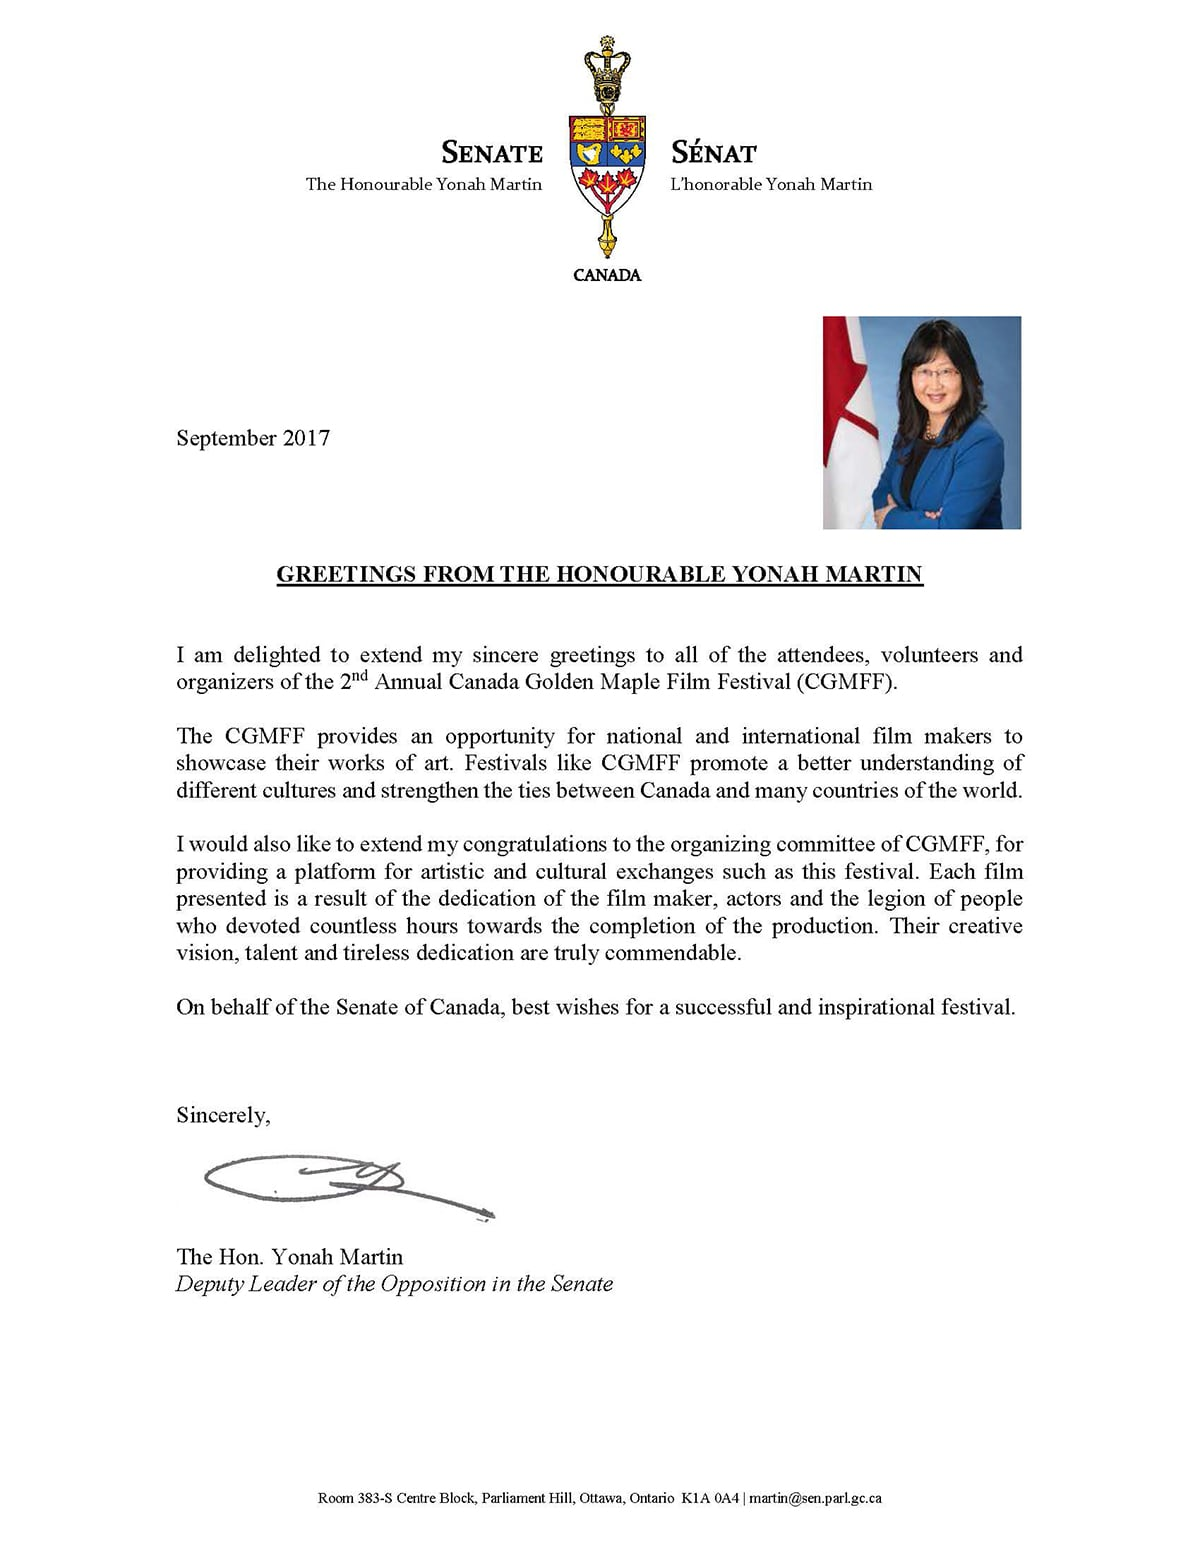 Congratulatory Letter from Honorable Yonah Martin, Senator